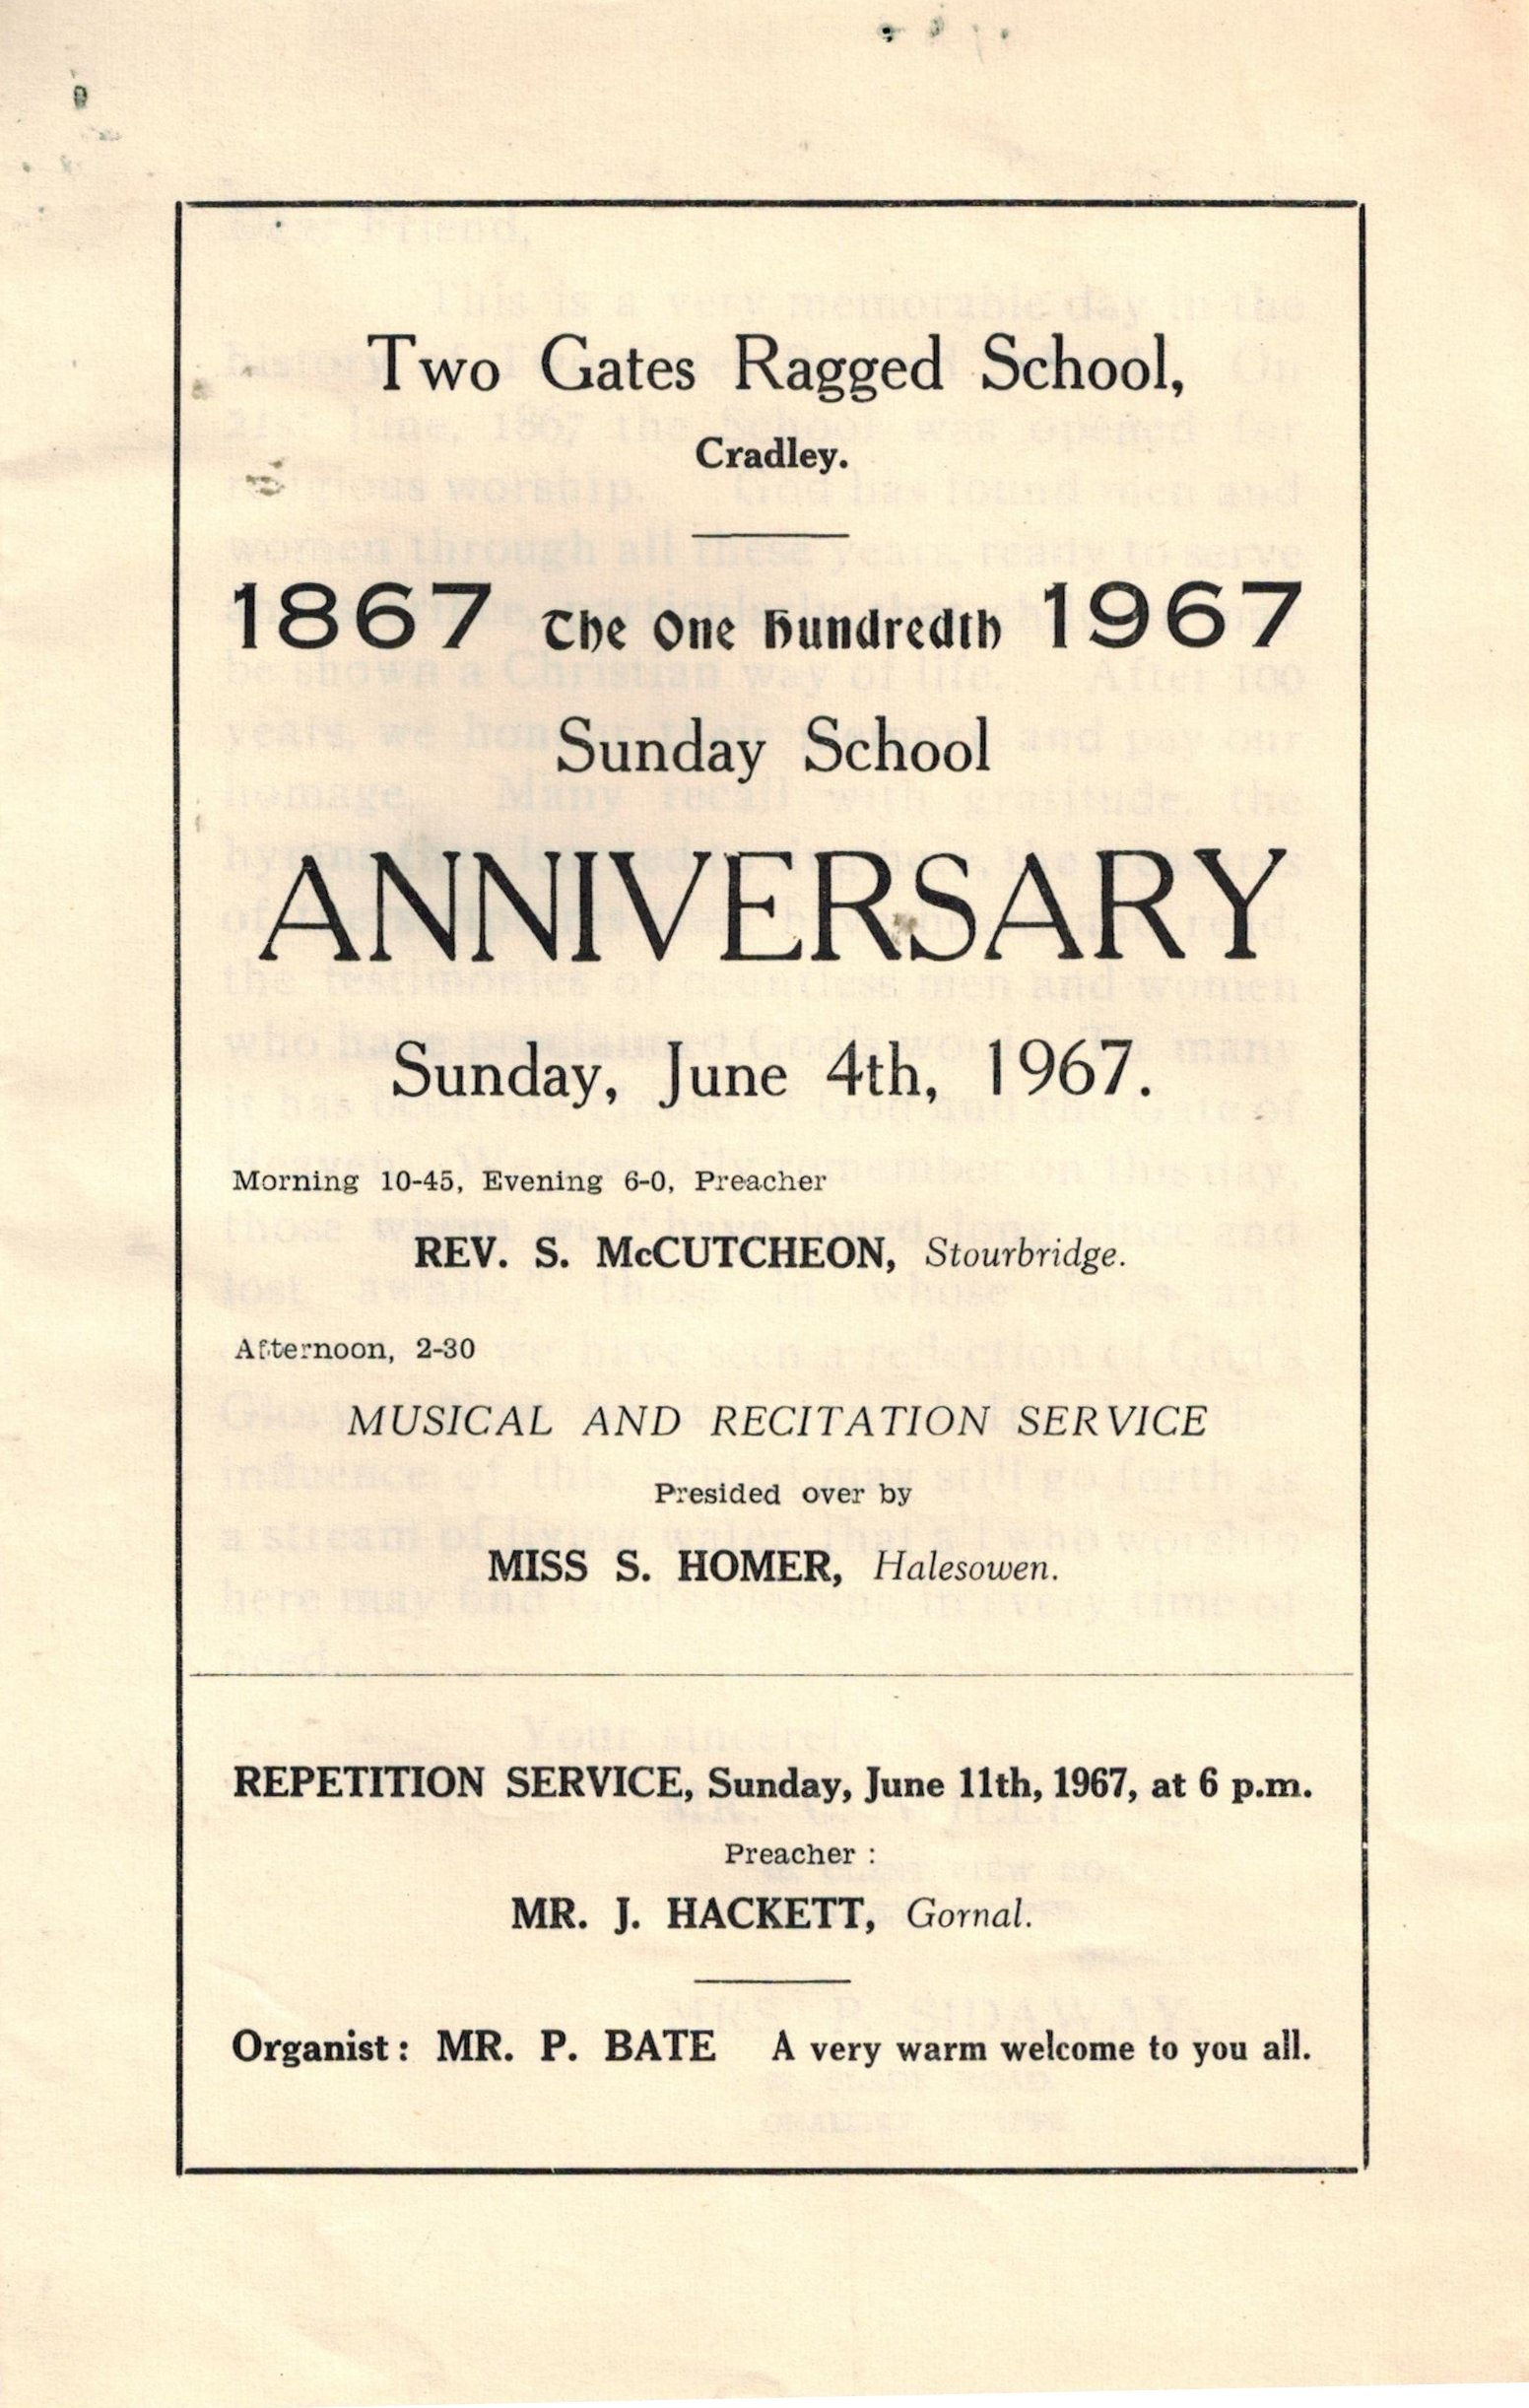 O008a_TGRS_100yrs_Anniversary_1967_06-04[Recital]